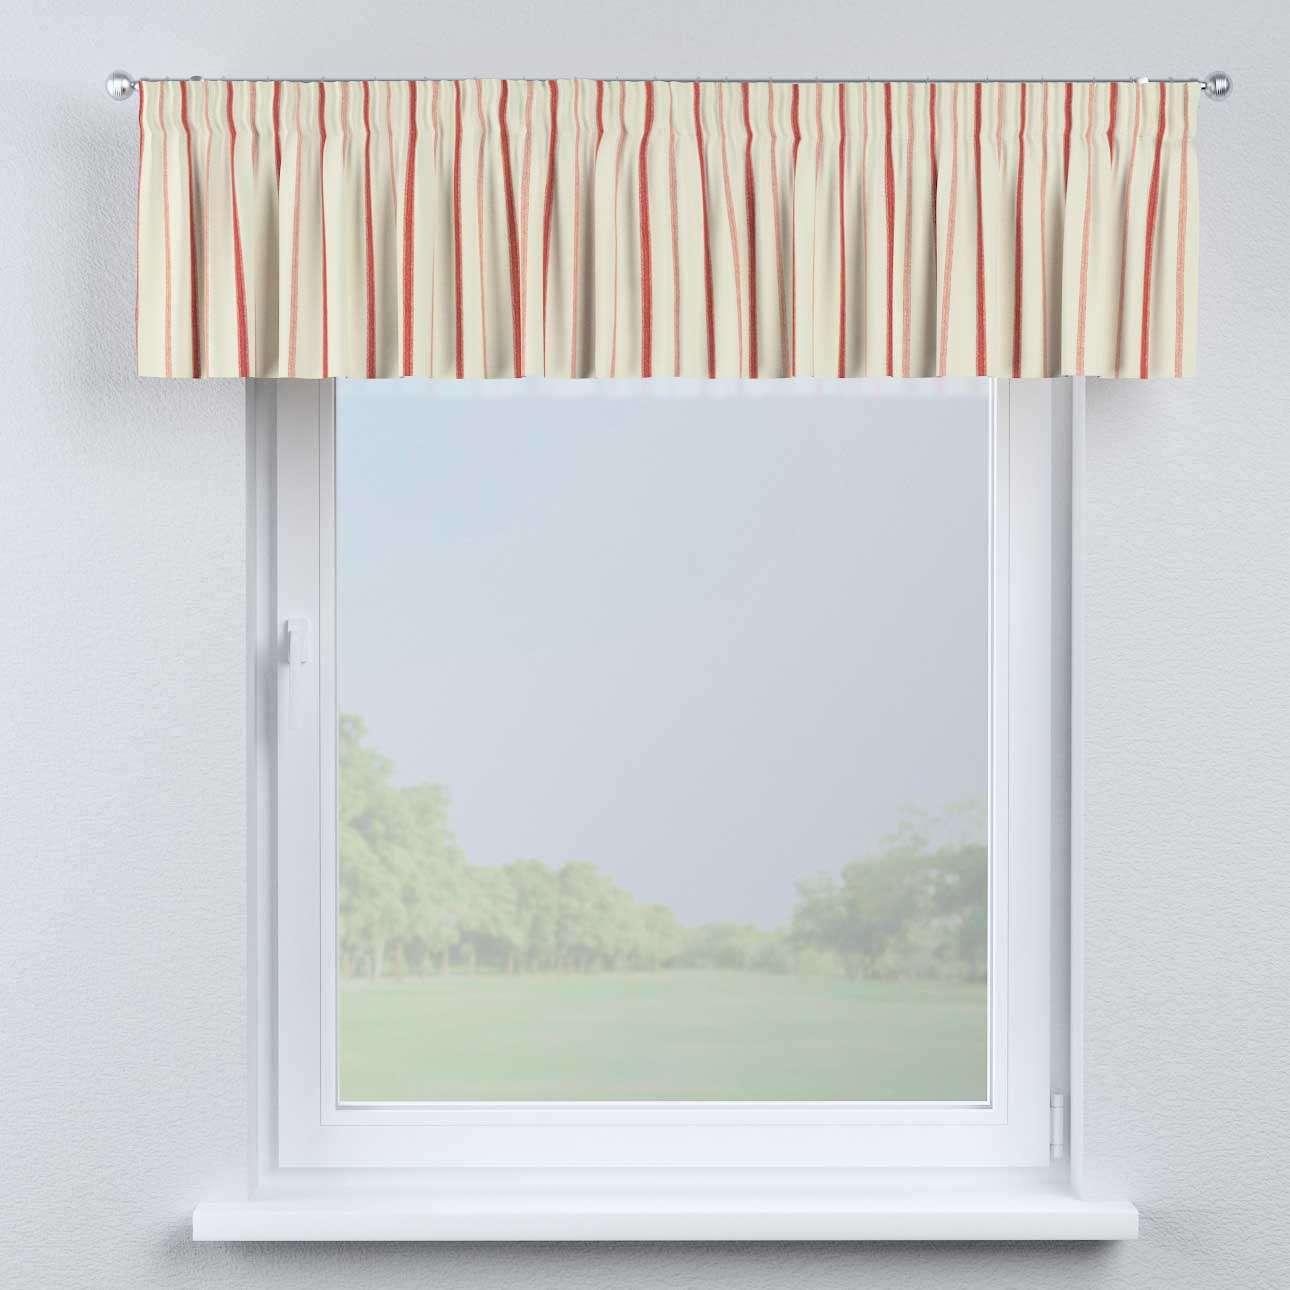 Pencil pleat pelmet 130 x 40 cm (51 x 16 inch) in collection Avinon, fabric: 129-15